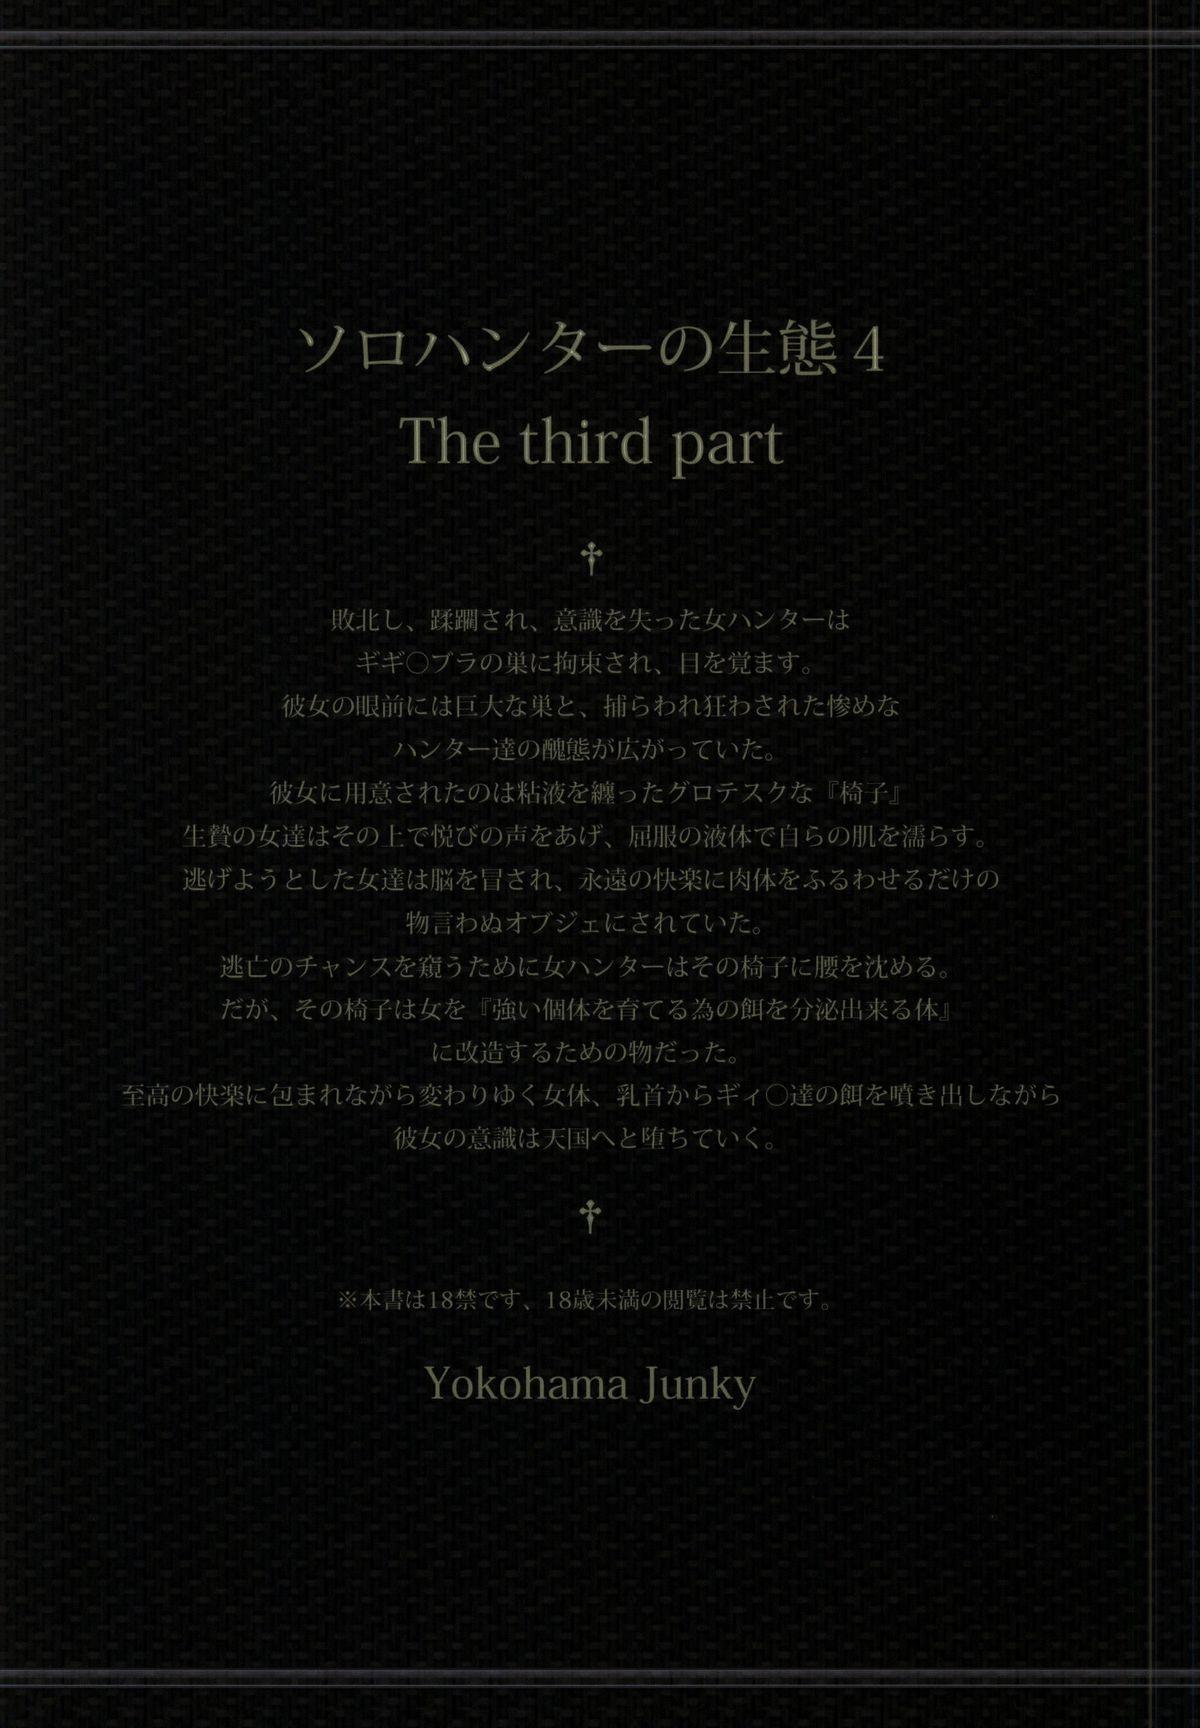 Solo Hunter no Seitai 4 The third part 51